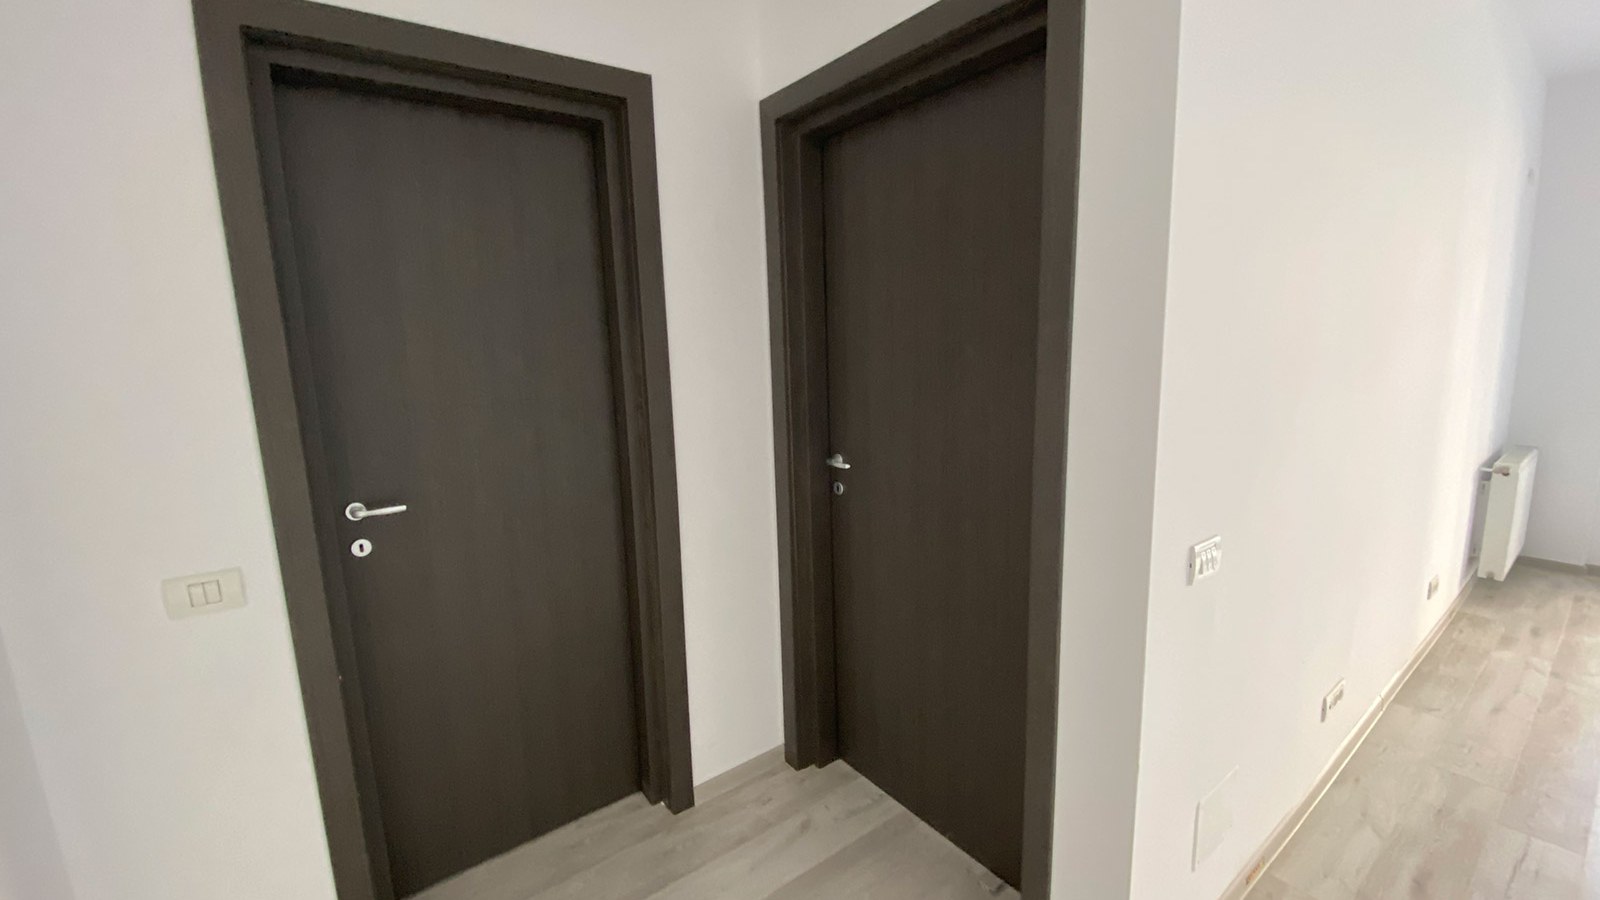 Stadiu executie Uverturii Residence 8 Iulie 2020 - Apartamente si garsoniere de vanzare Militari, Gorjului - 13